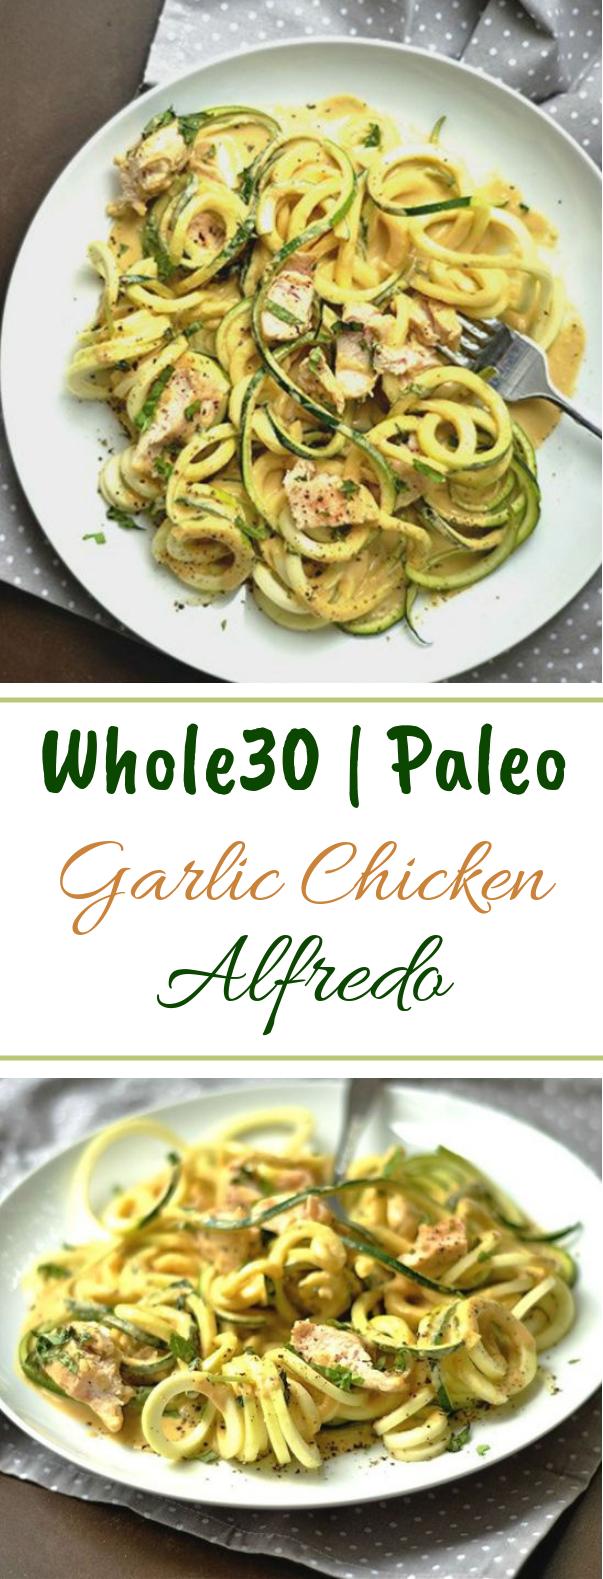 Paleo Garlic Chicken Alfredo #healthy #lowcarb